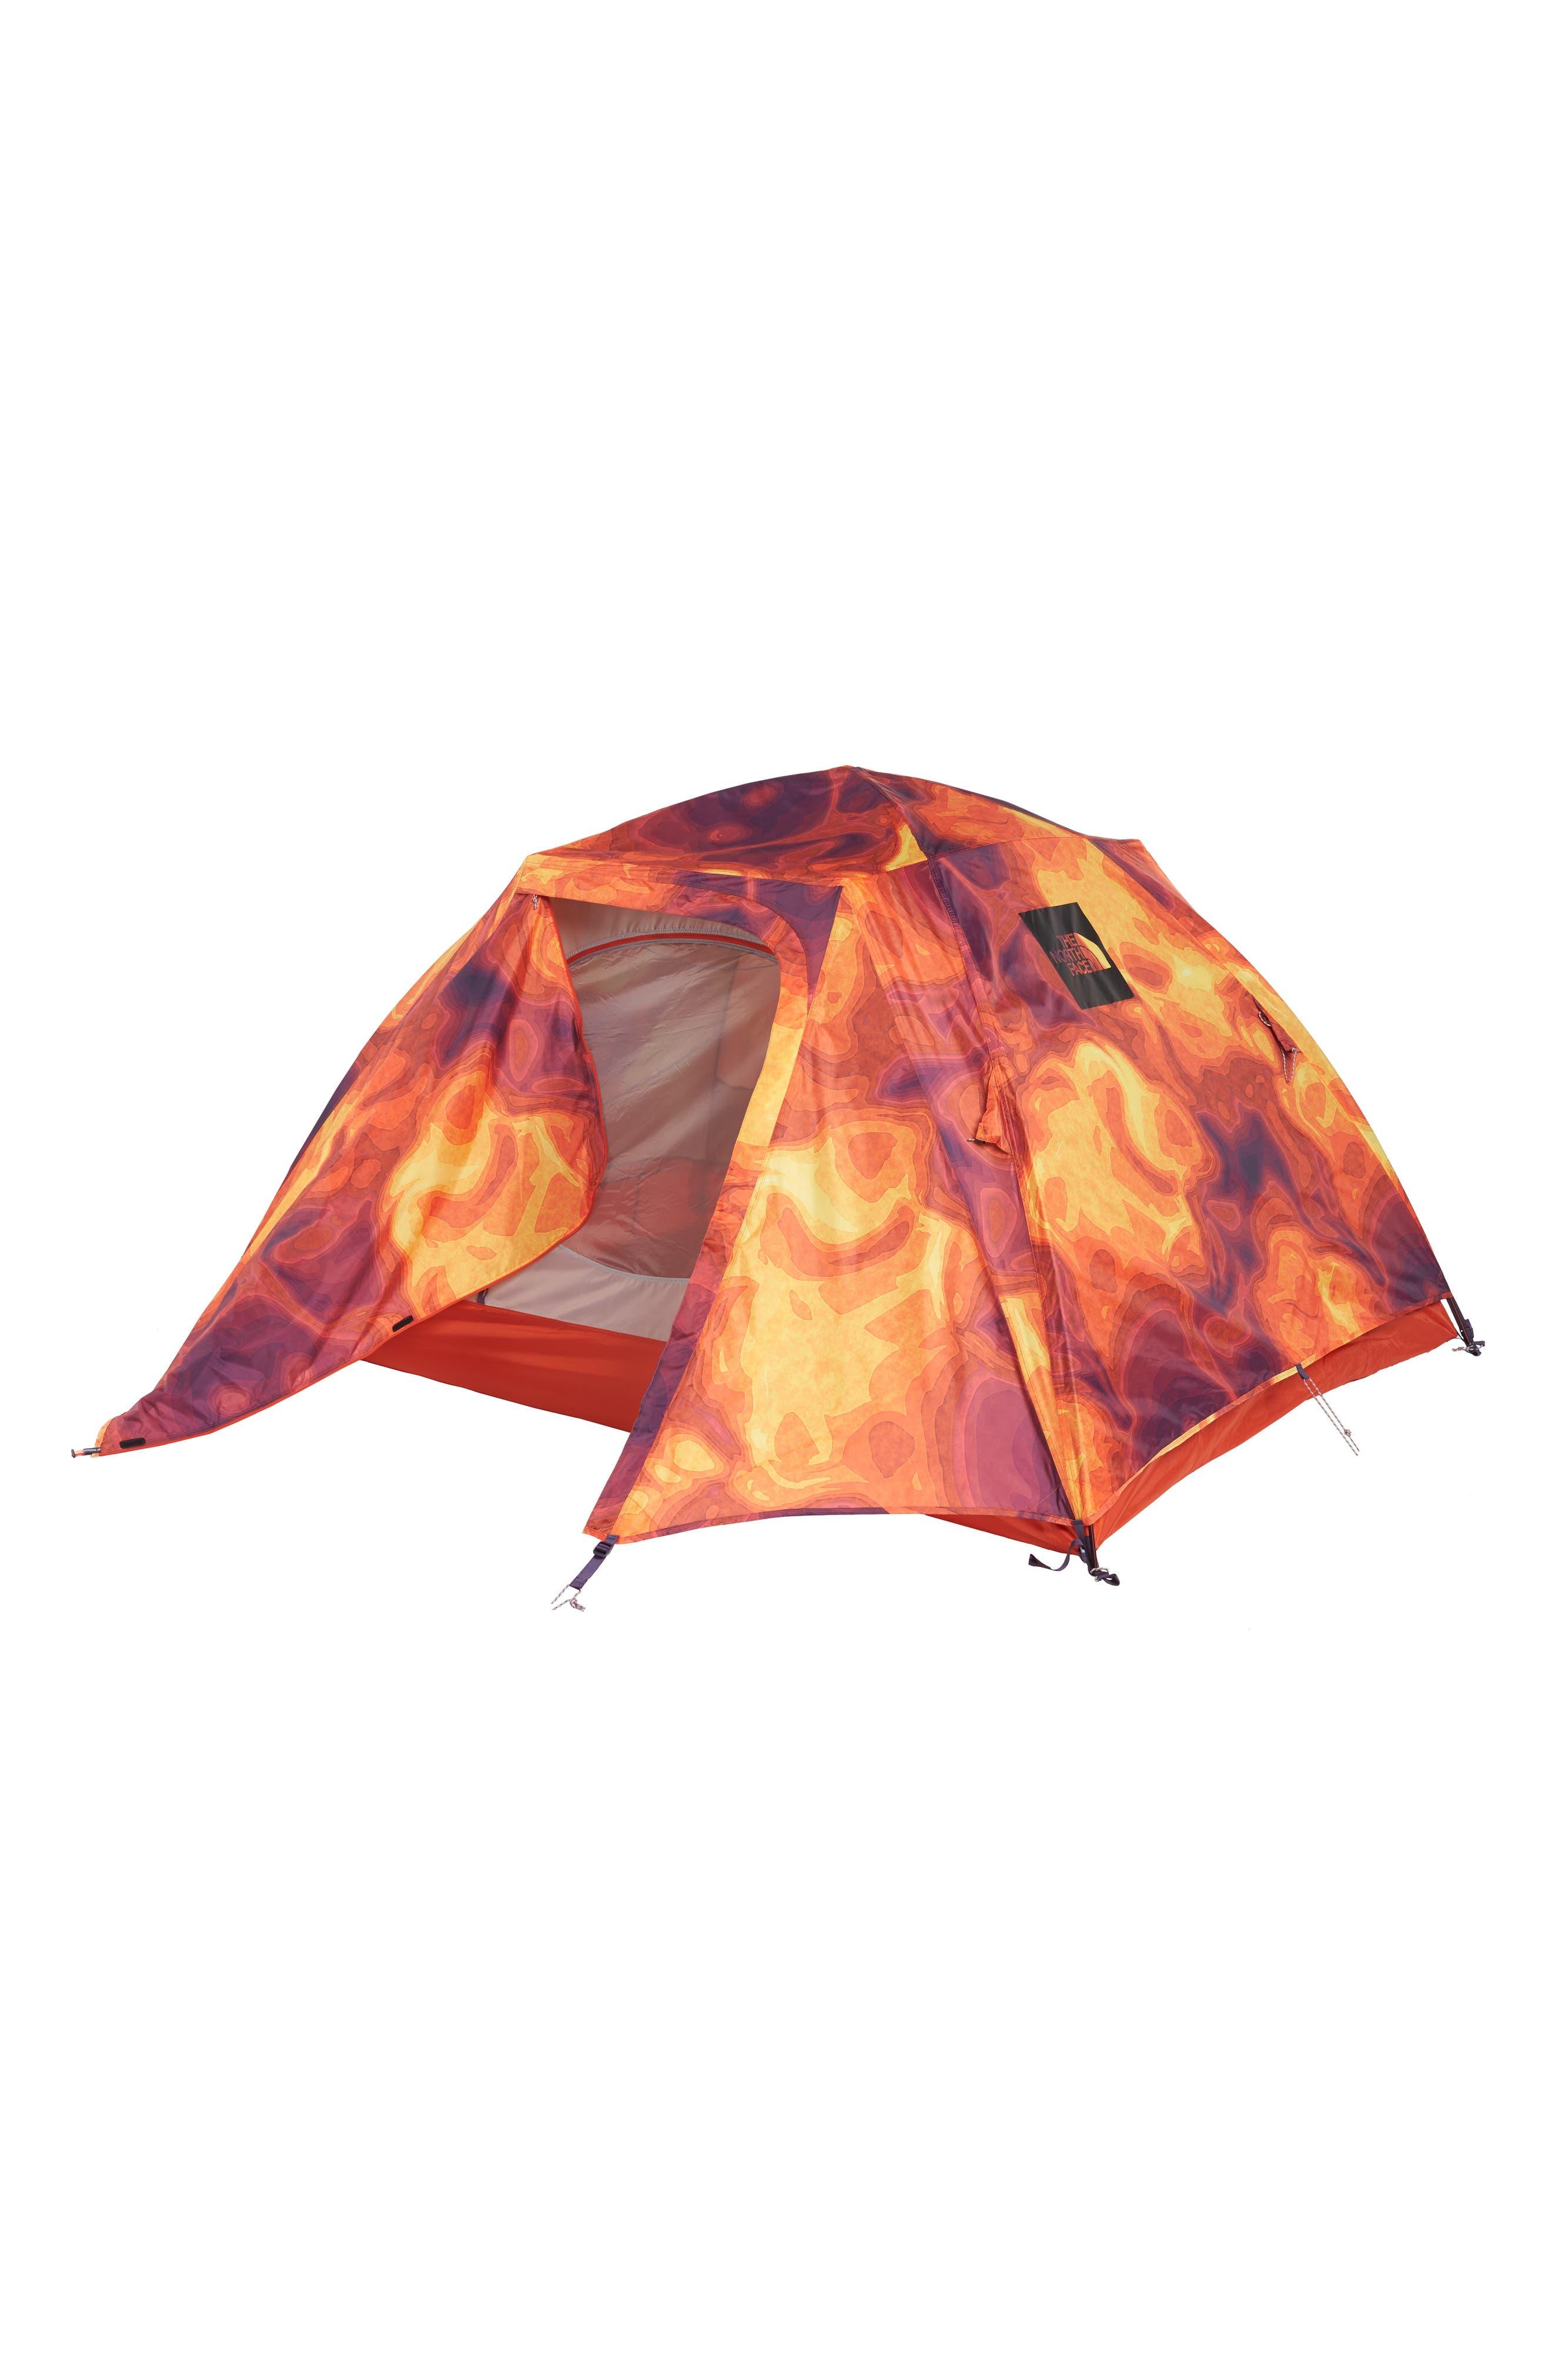 Homestead Roomy 2 Tent,                             Main thumbnail 1, color,                             Tibetan Orange/ High Rise Grey